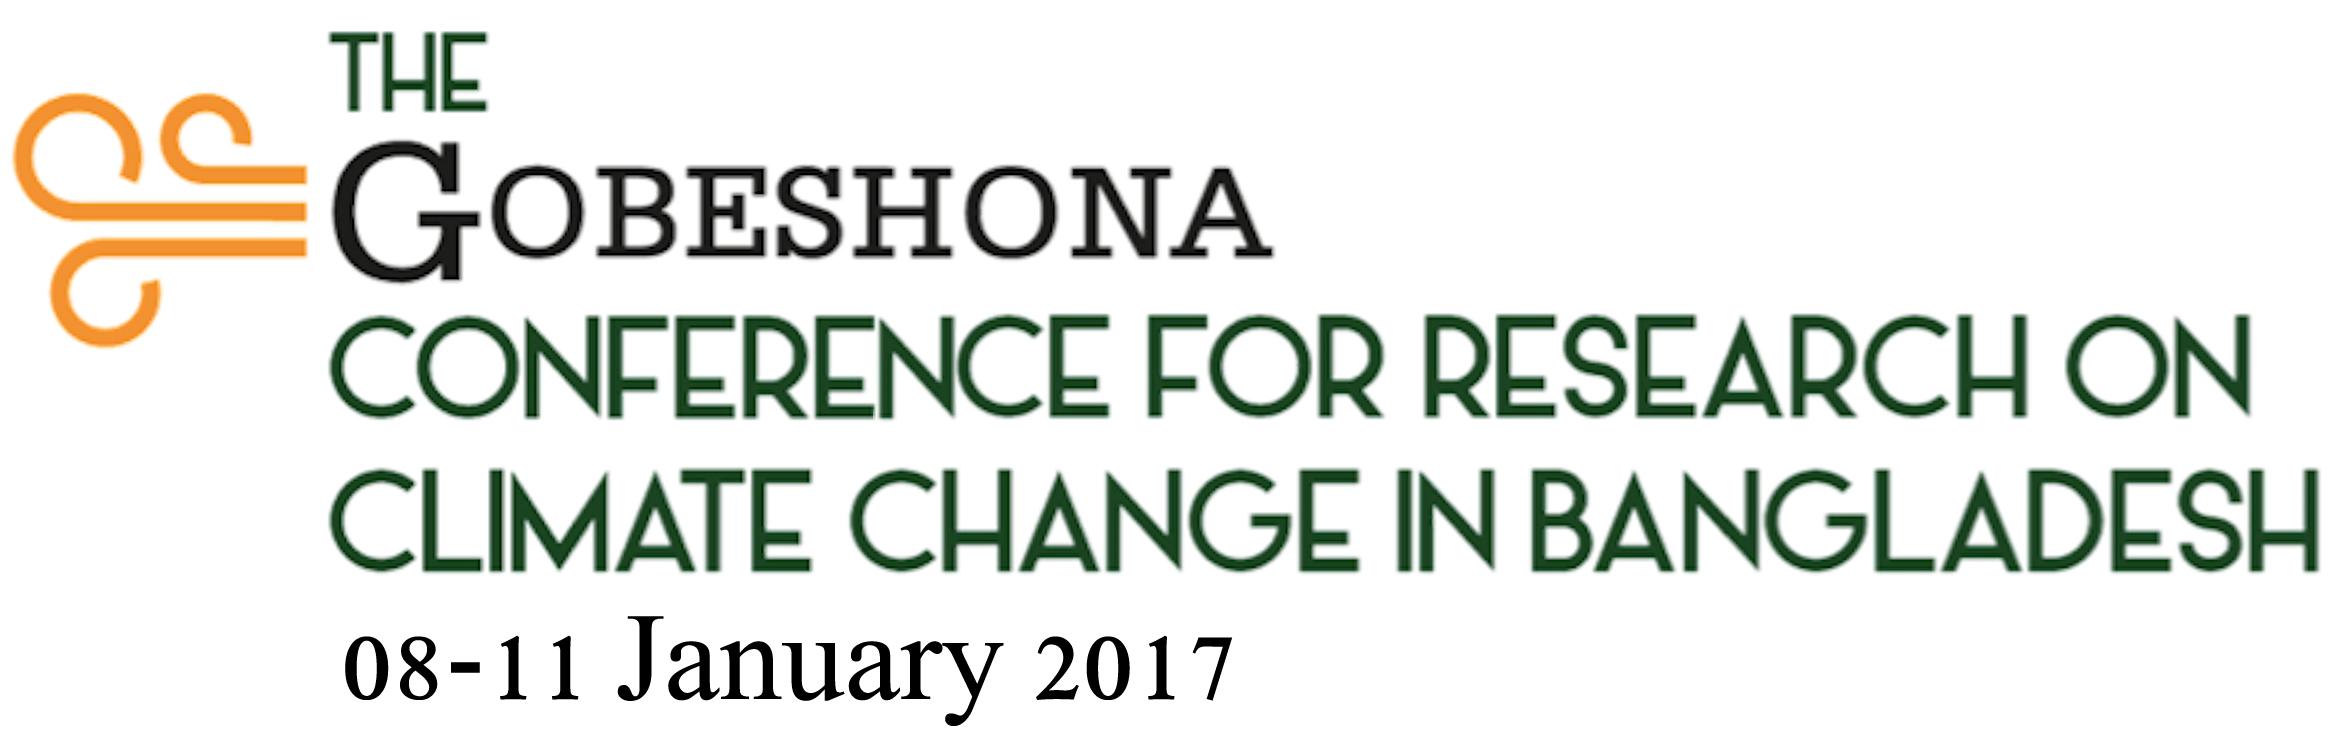 Gobeshona Conference logo></a><br><br></div> </aside><aside id=